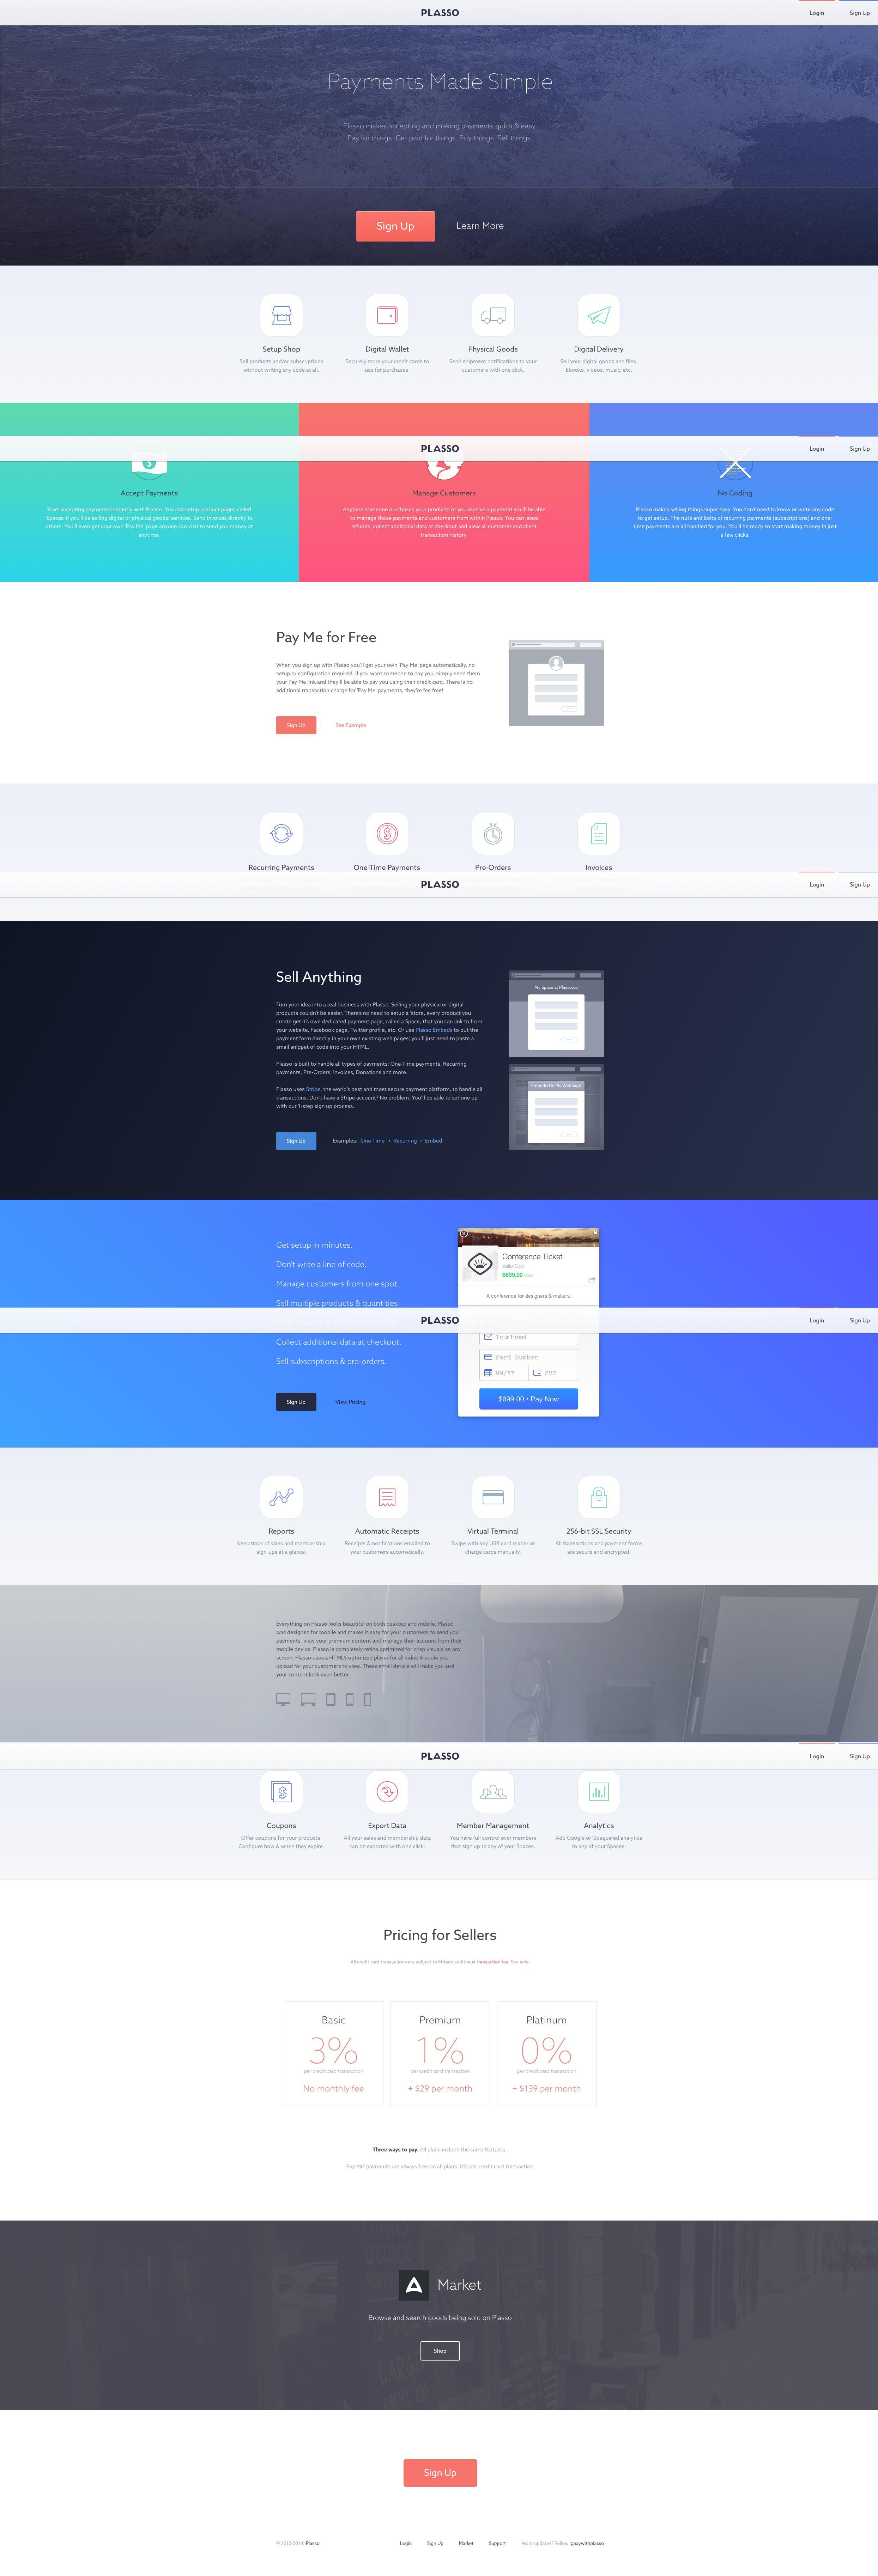 Pin By Prabhakar Seenappa On Web Design Web Layout Design Web Design Mobile Web Design